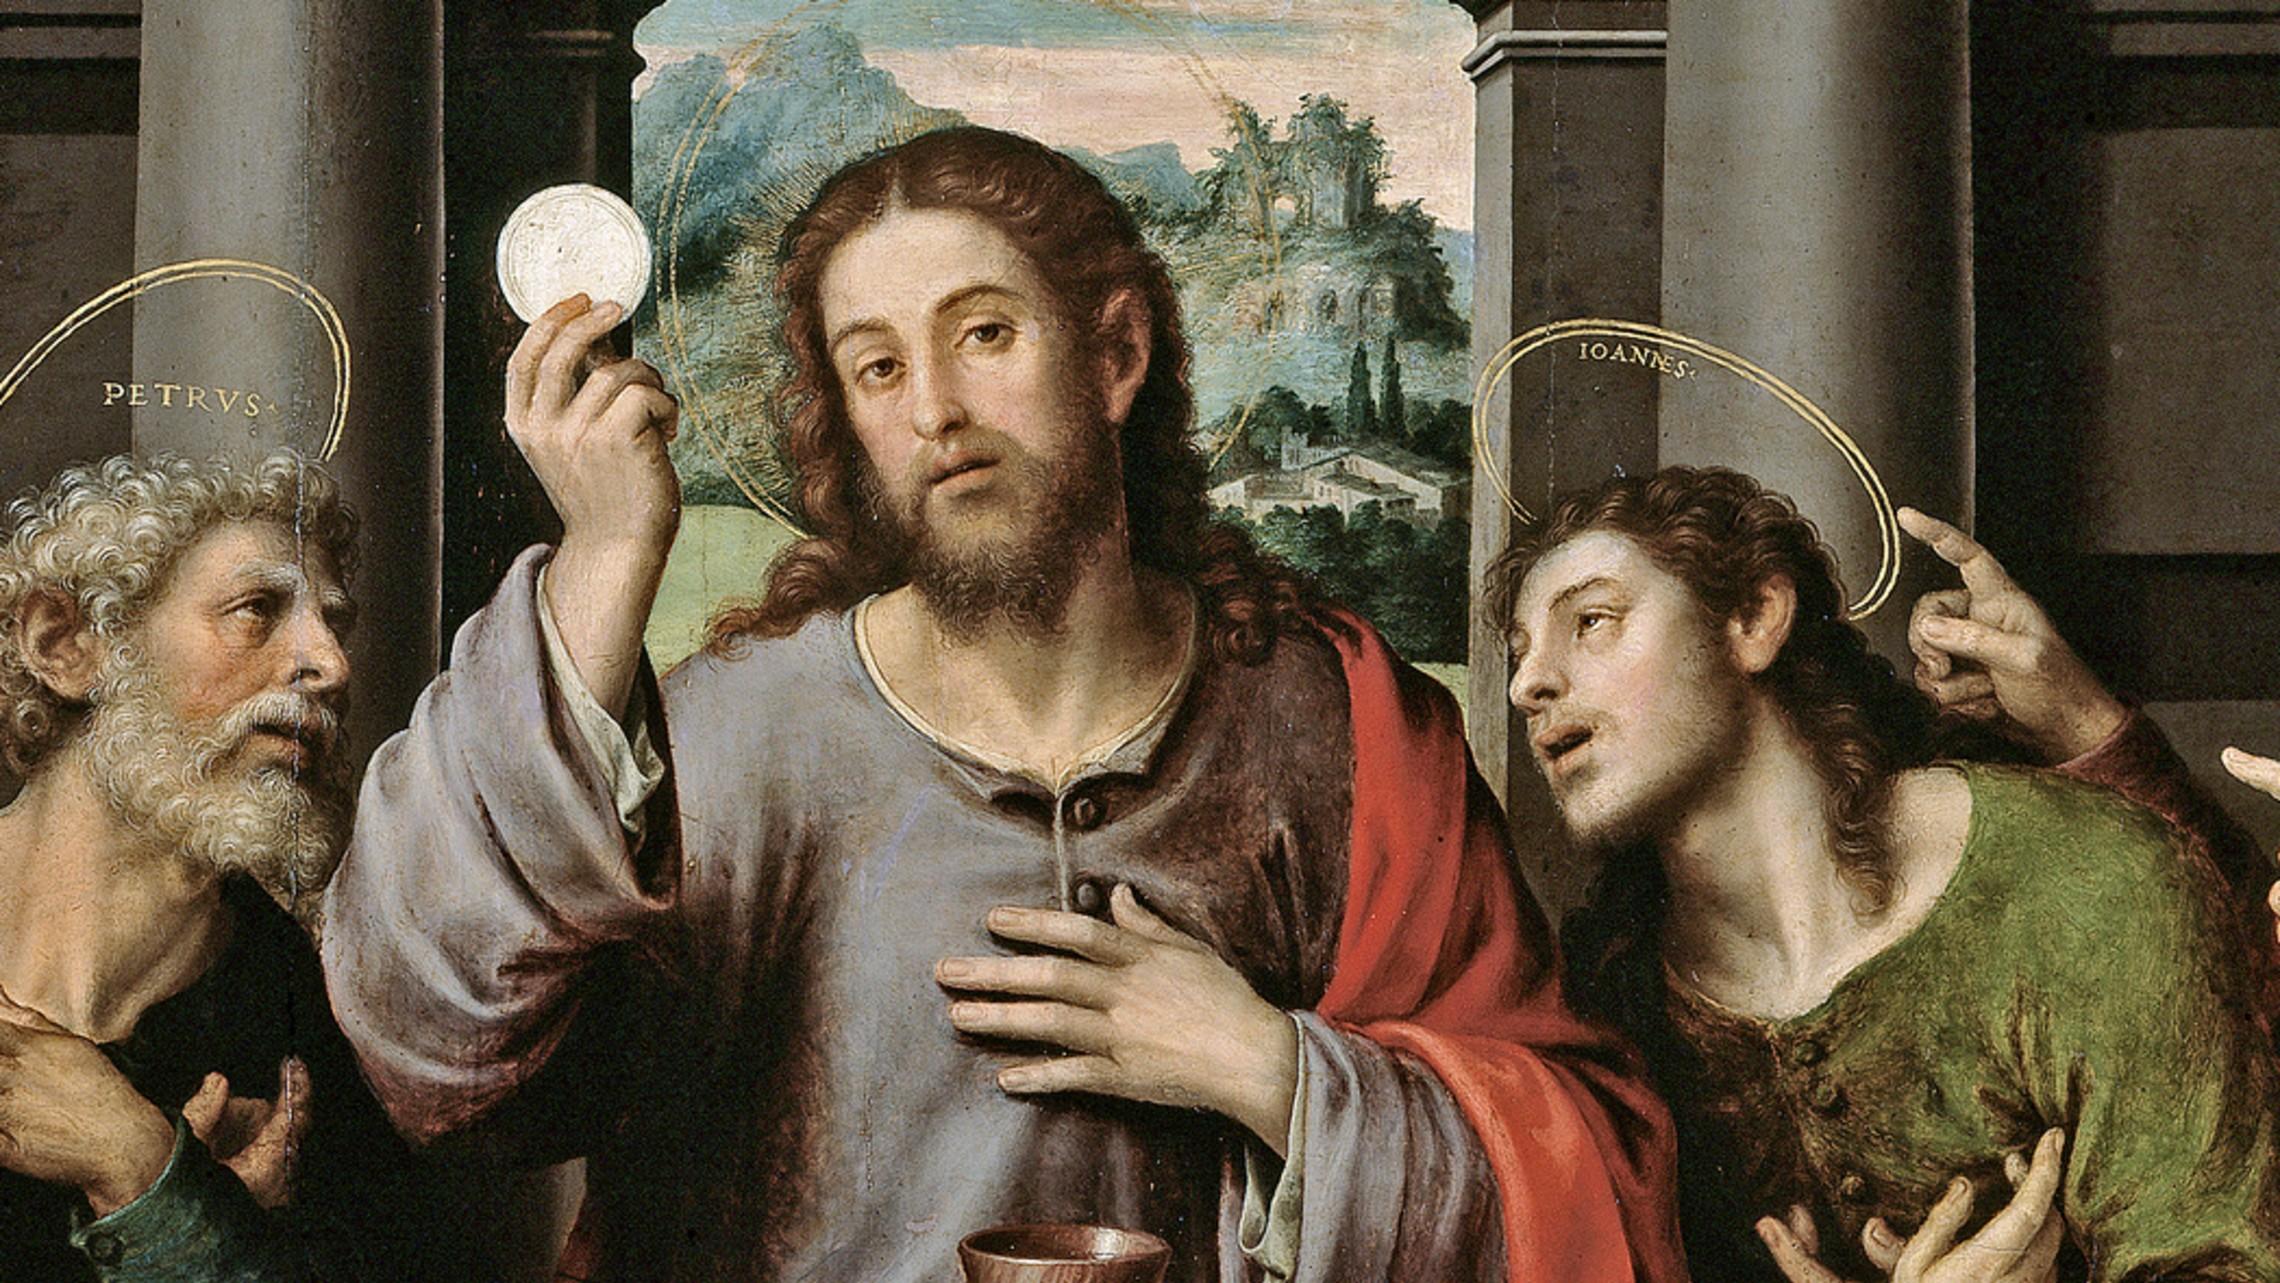 Jesus and the Eucharist